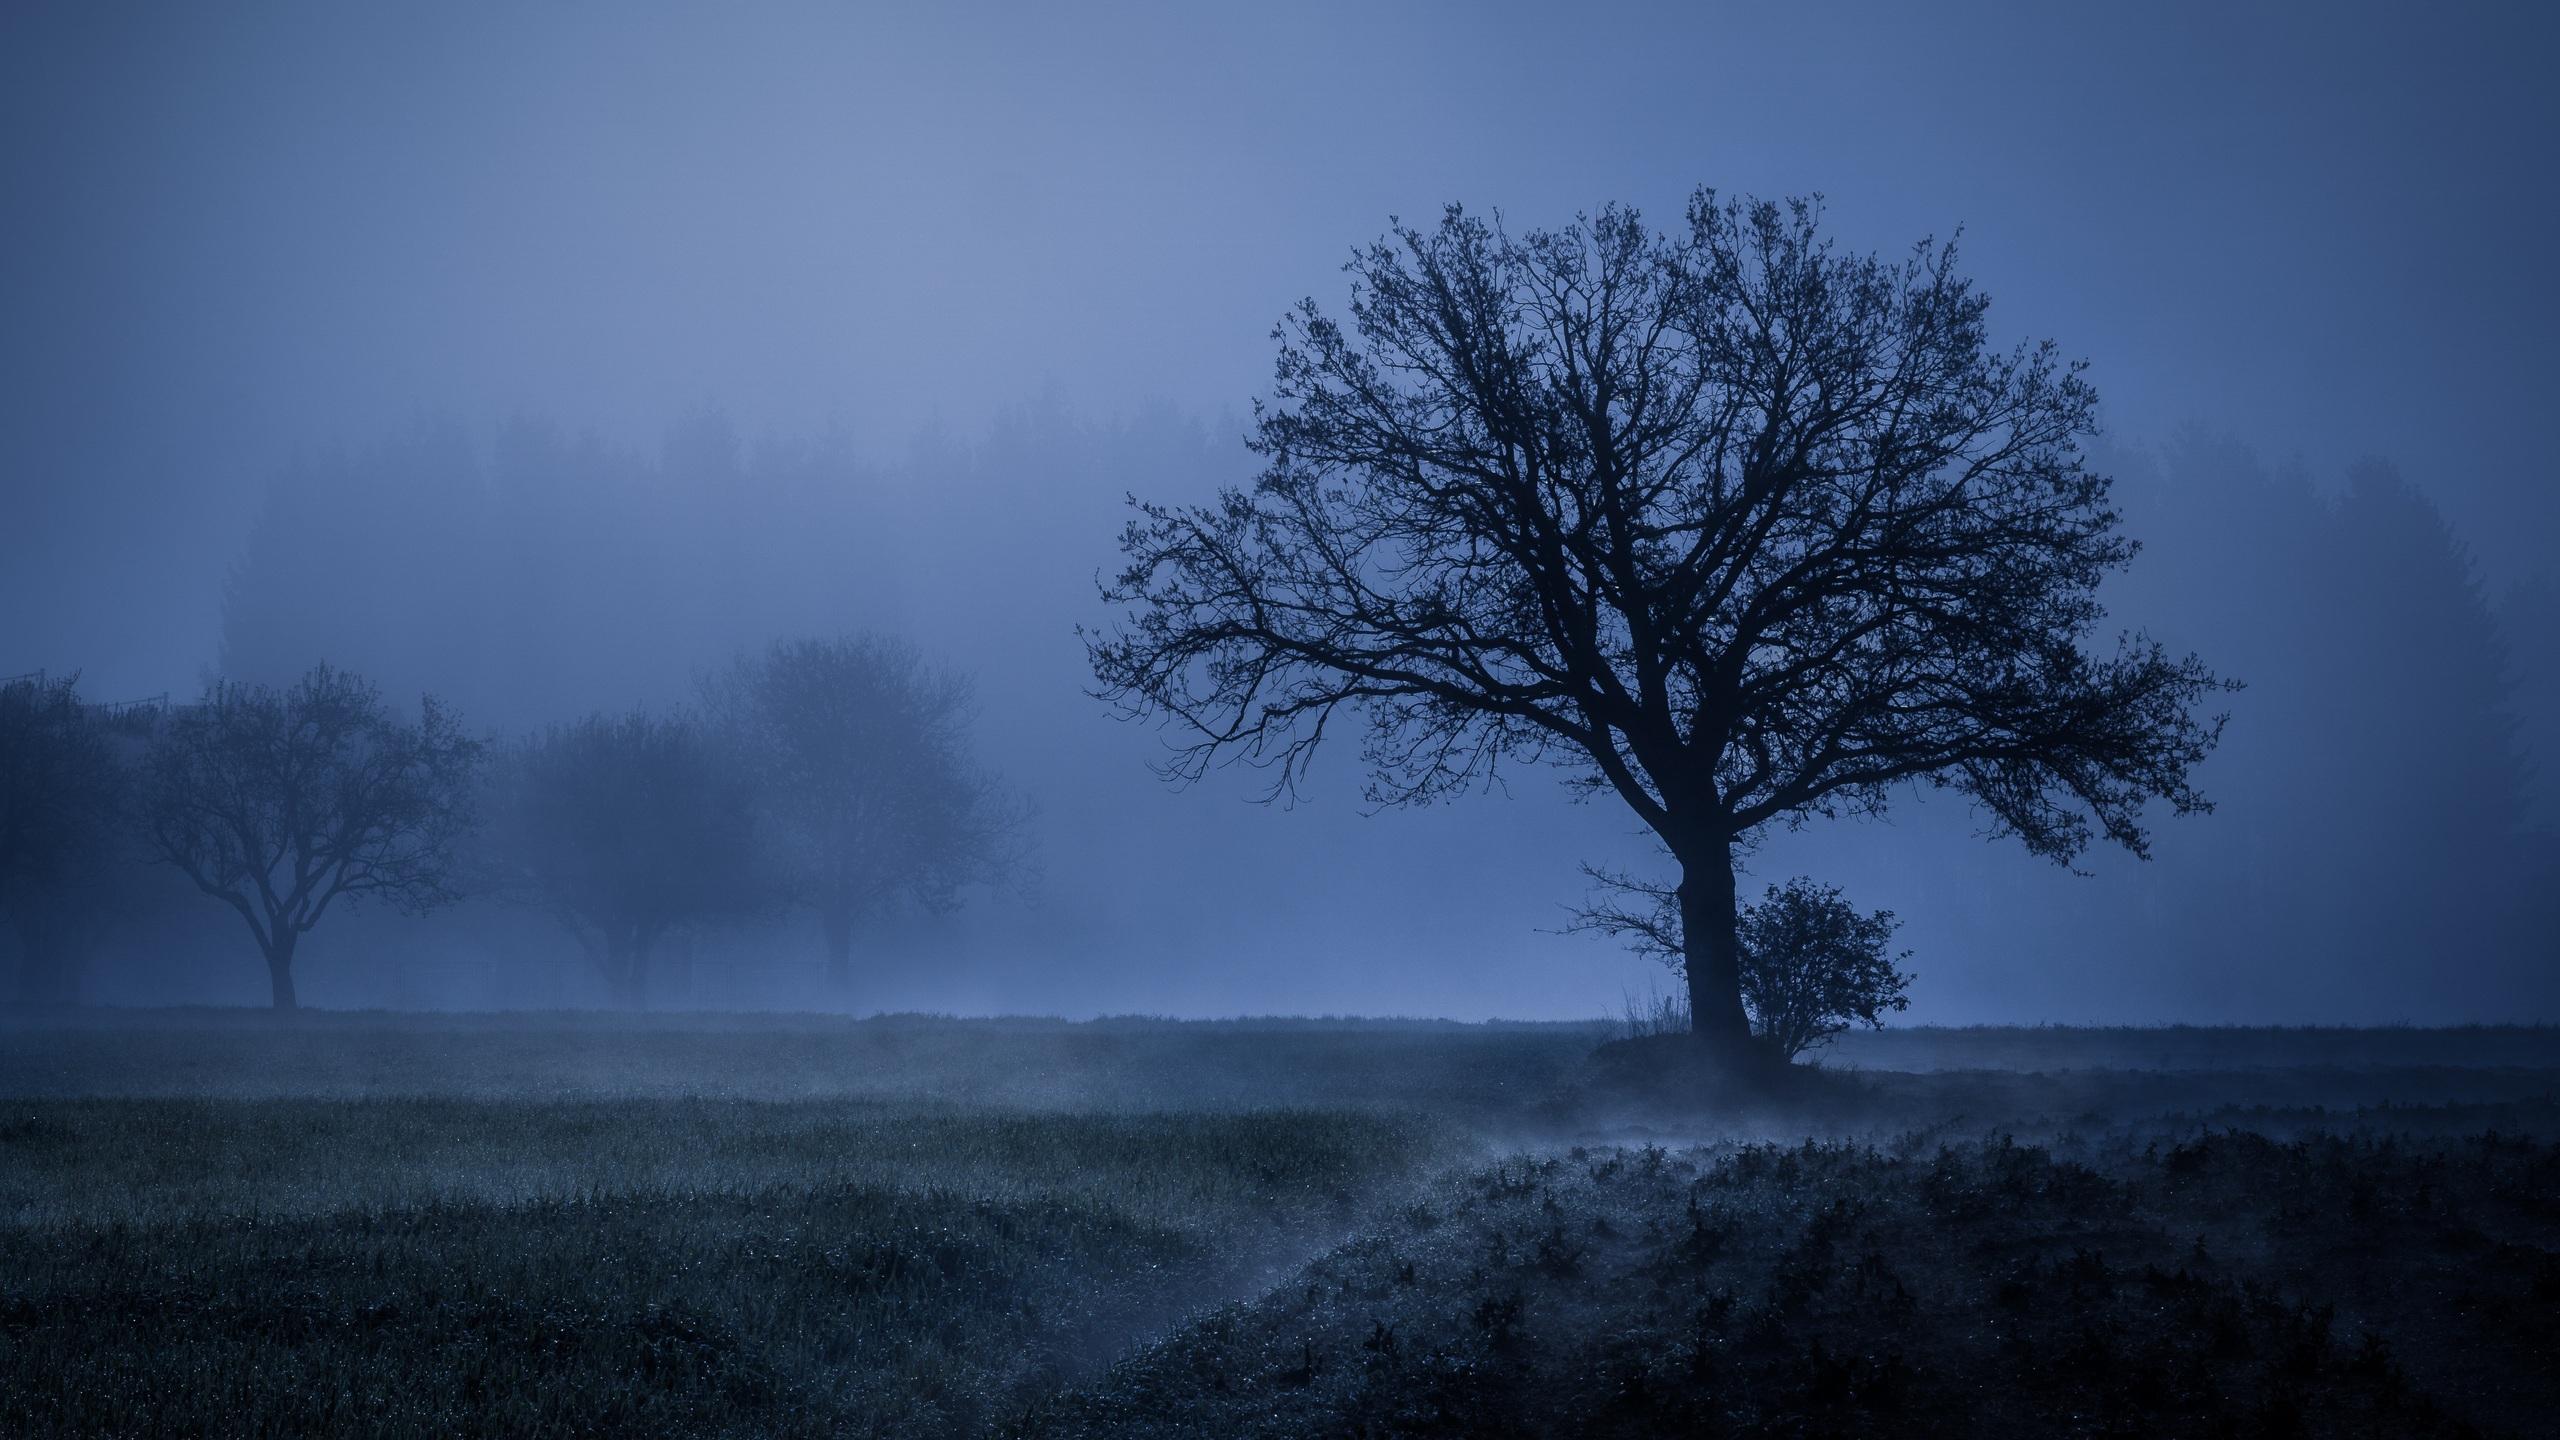 Field Fog Trees Blue Weather Cold 4k 5k